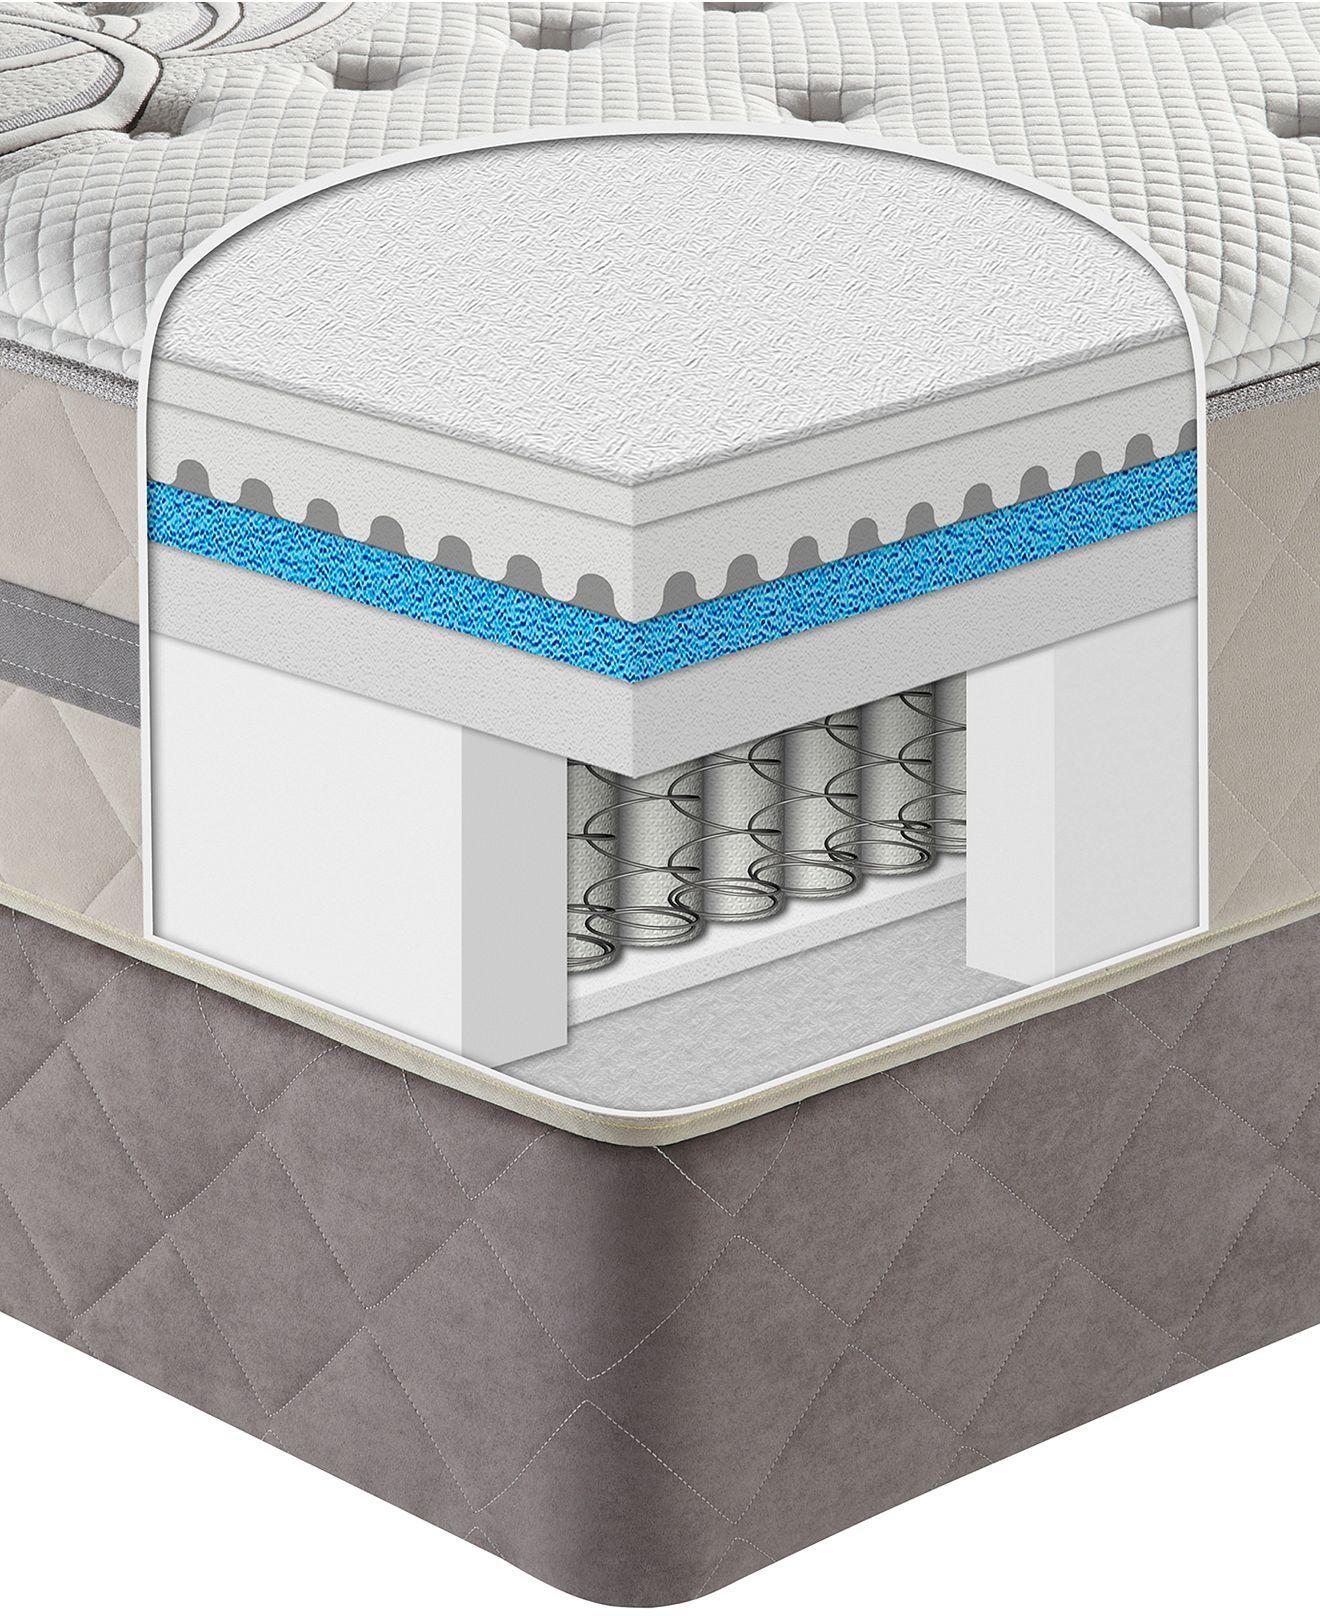 Sealy Posturepedic Hybrid Queen Split Mattress Set Fulfillment Top Cushion Firm Mattresses Macy S